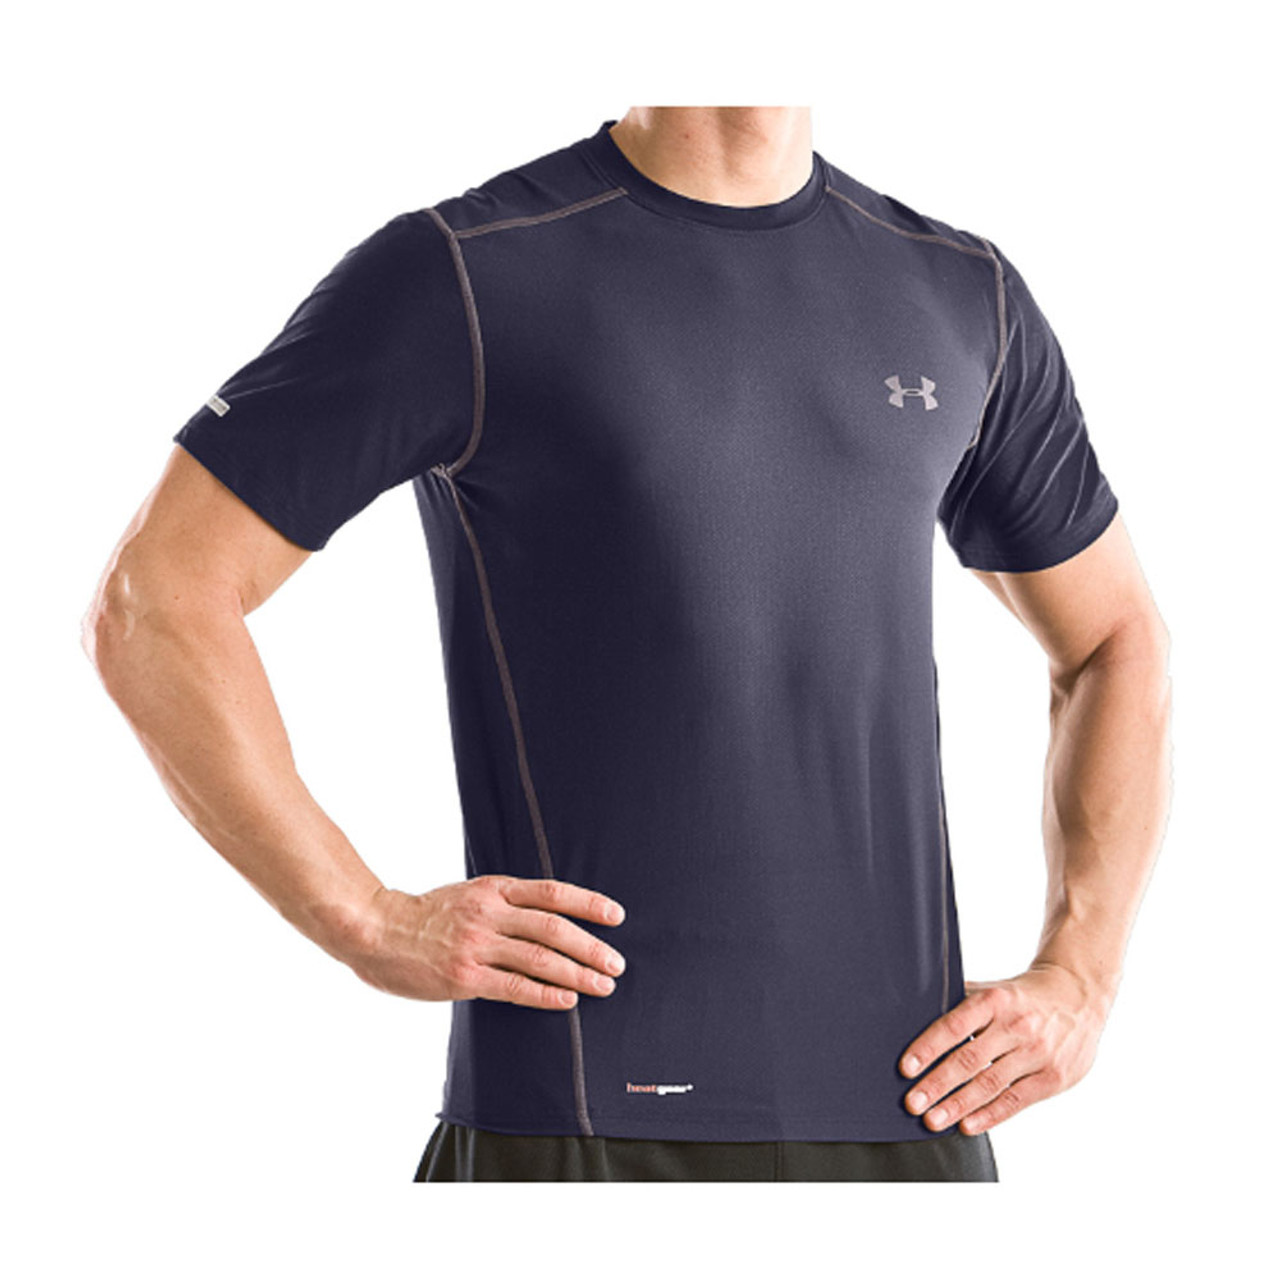 Activewear Under Armor Heatgear Xl Shirt